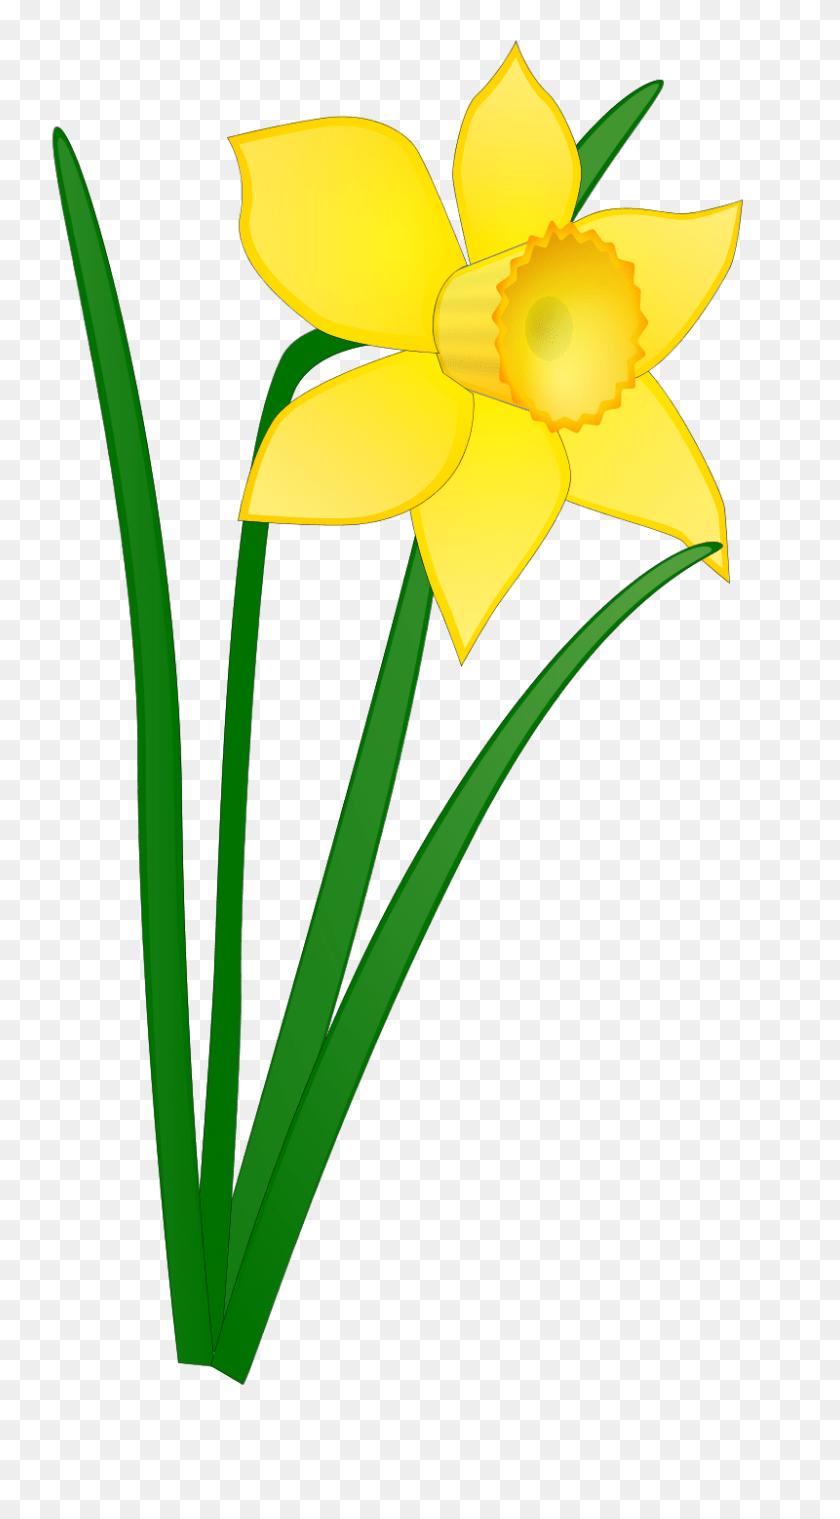 medium resolution of 800x1497 april clip art april flowers clip art